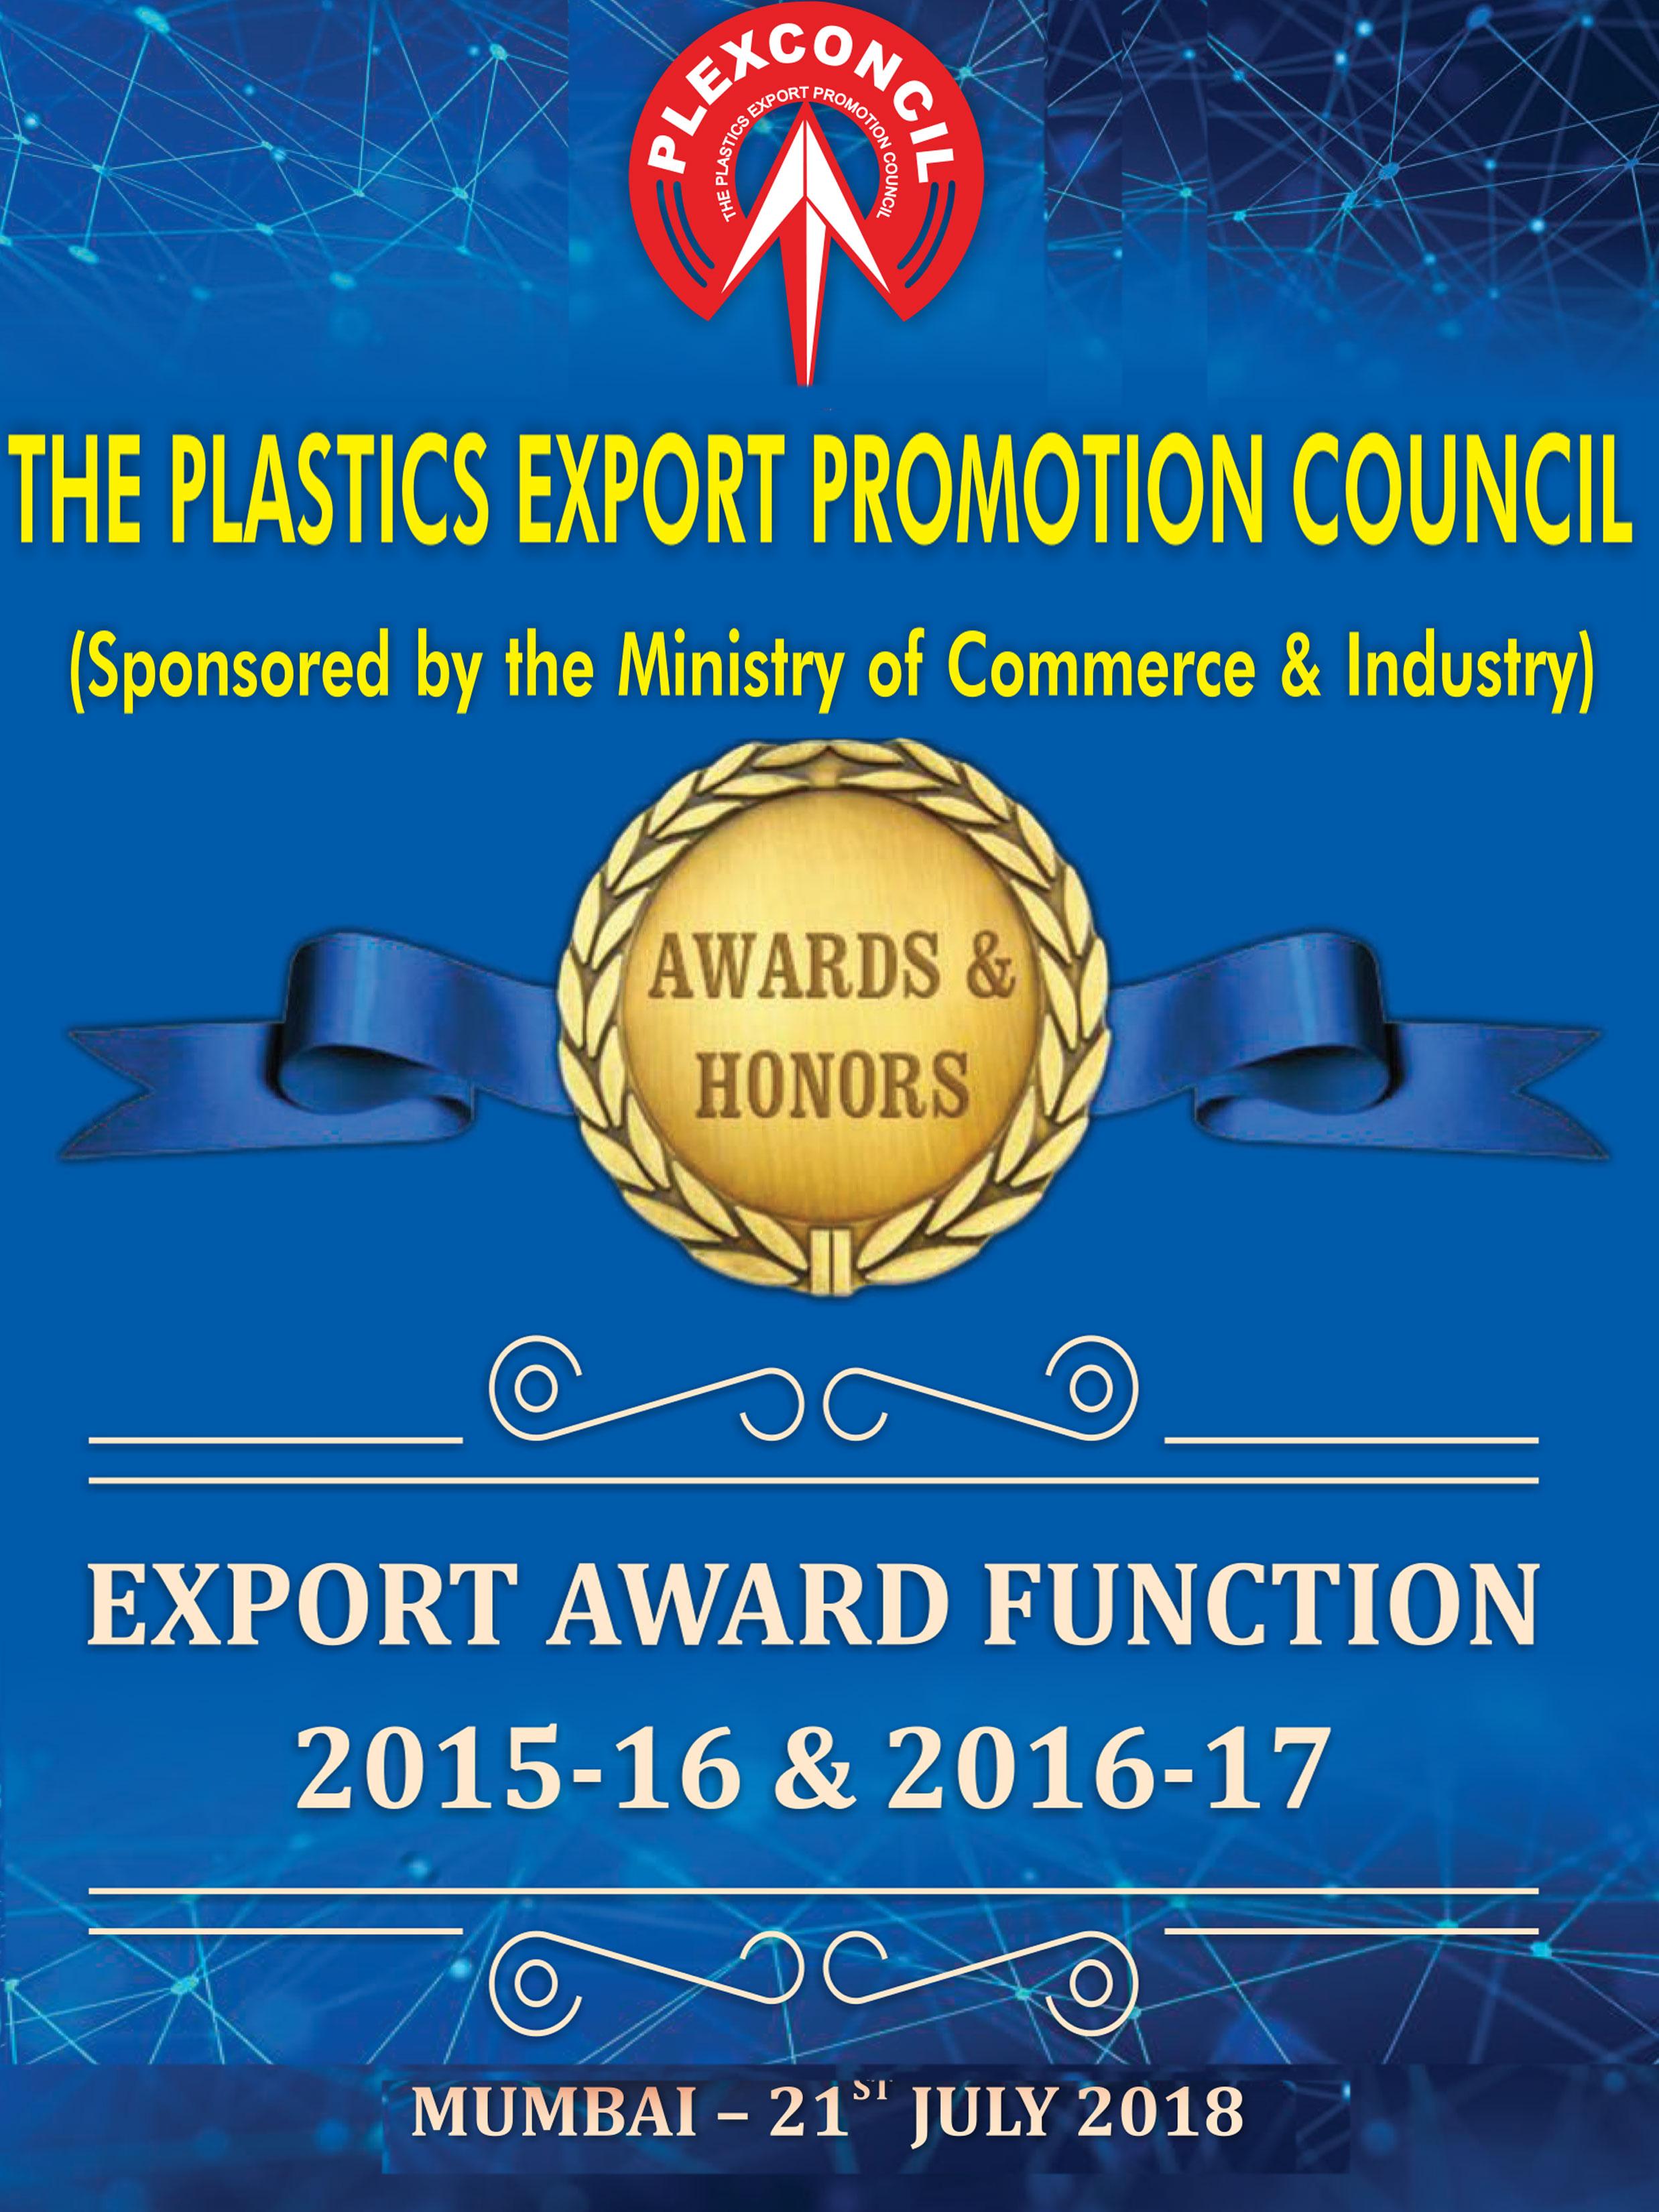 The Plastic Export Promotion Council